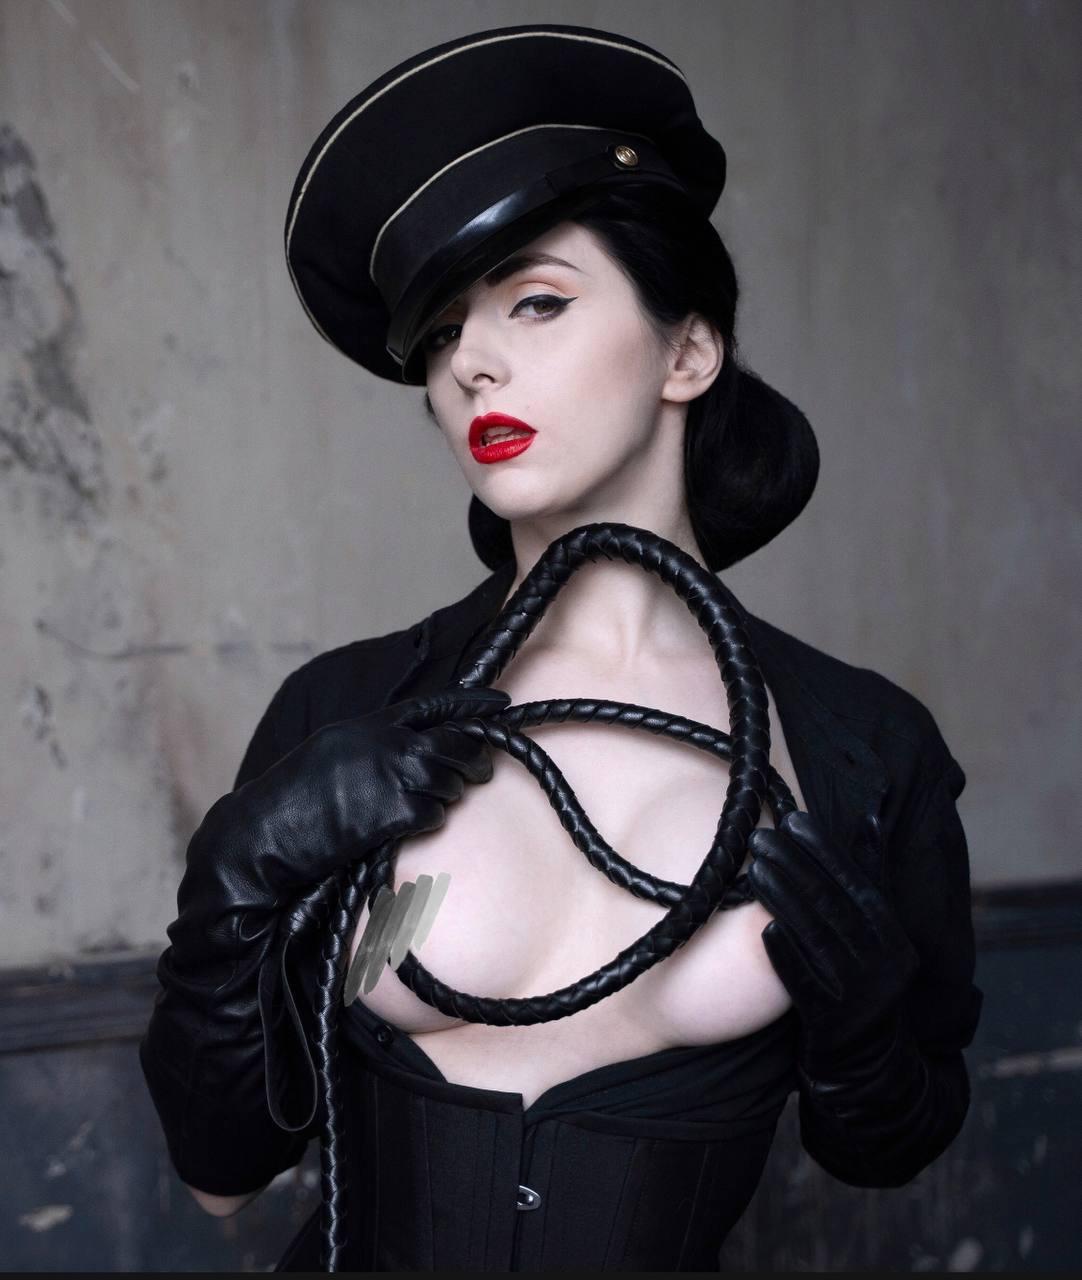 Lady In Black ❤️